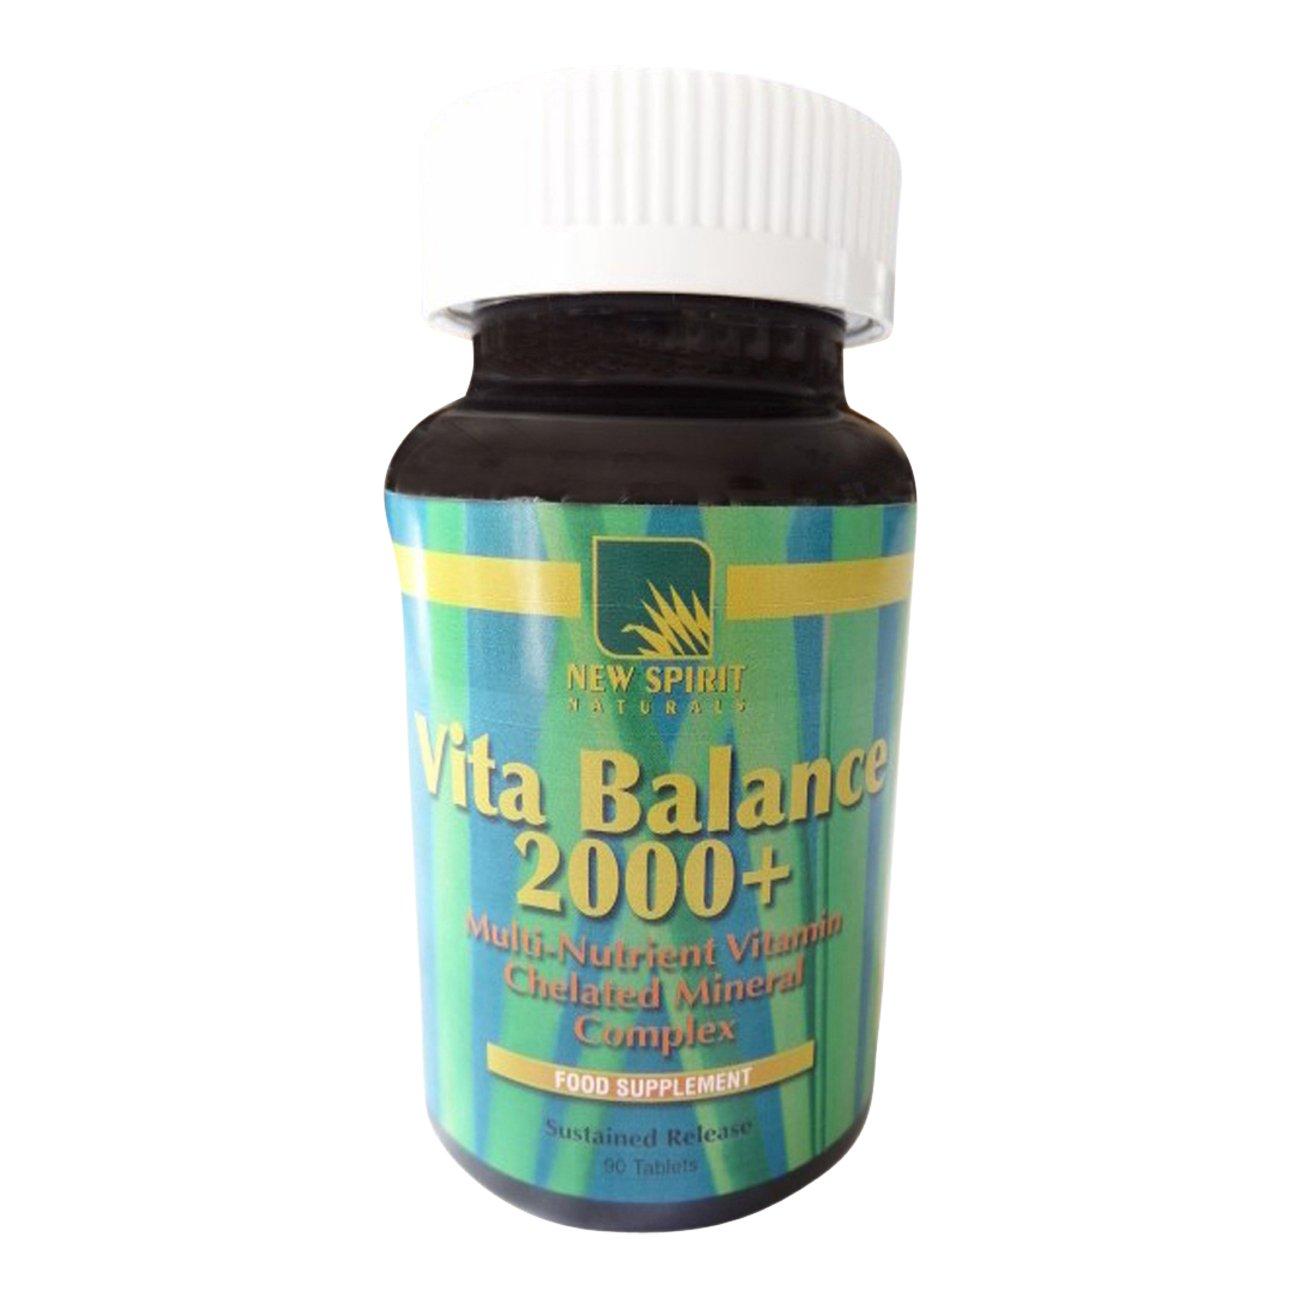 Vita Balance 2000 – Best Balanced Multivitamin